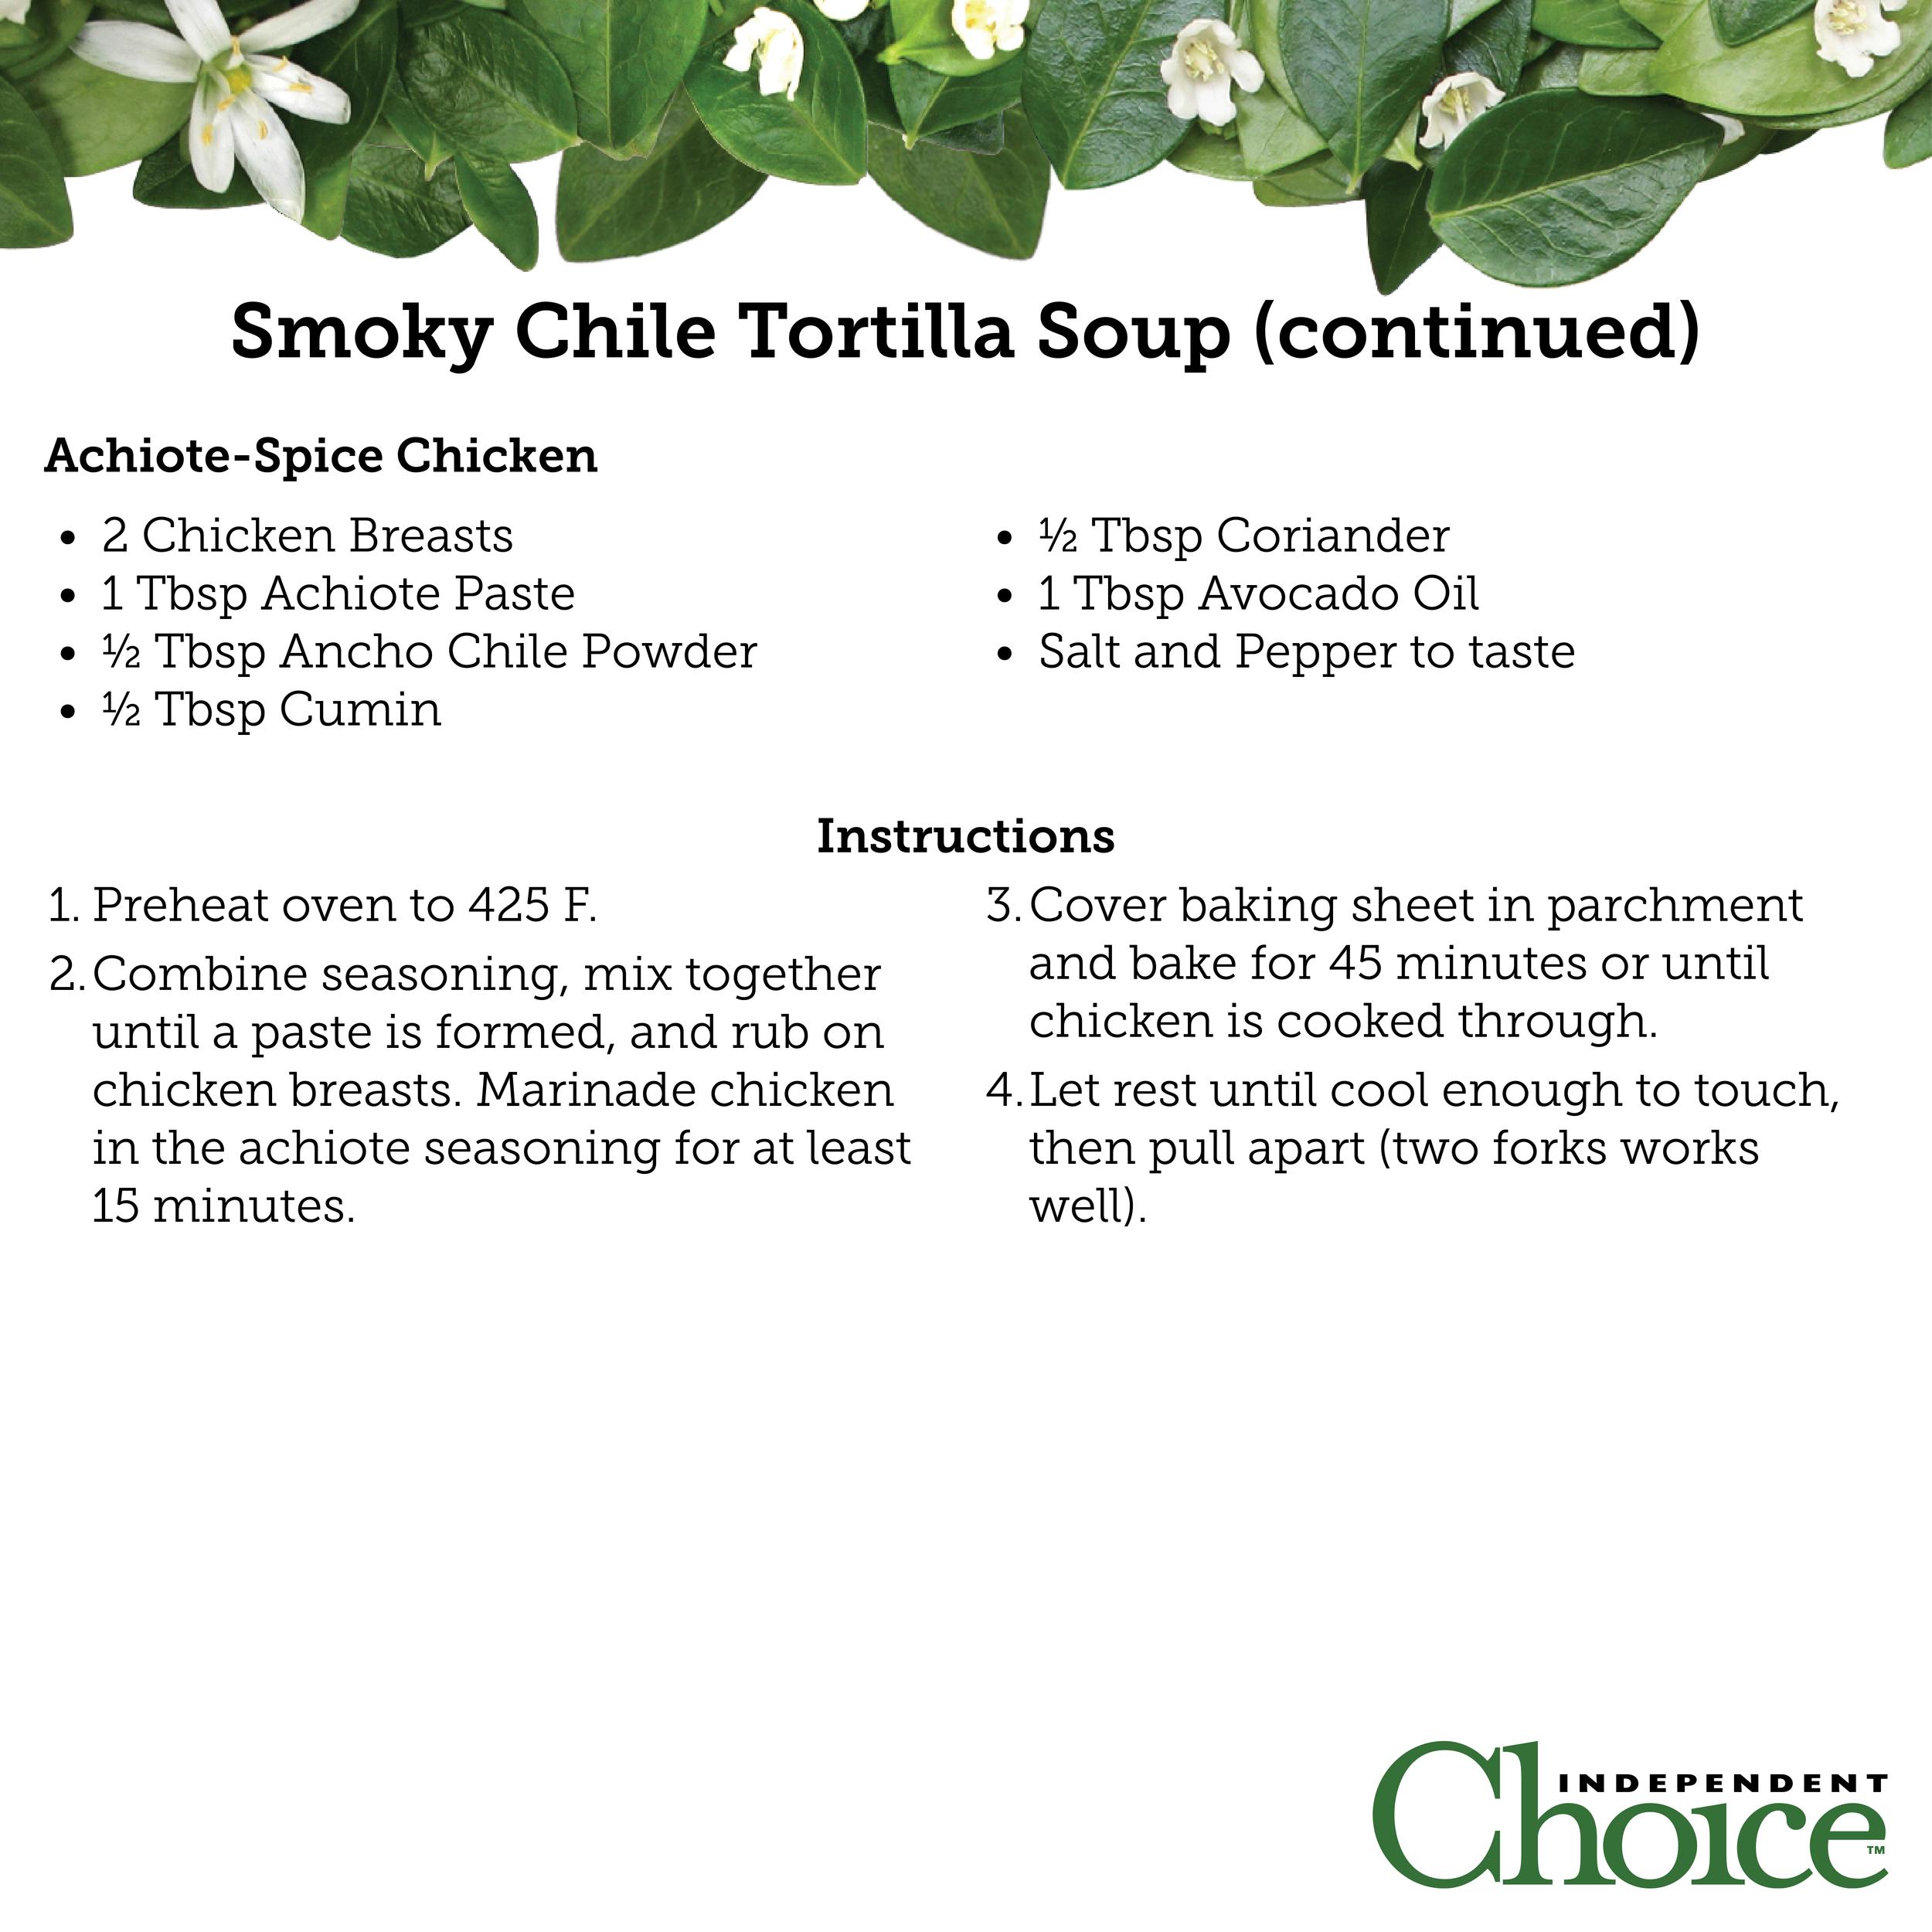 Smoky Chile Tortilla Soup 2.png